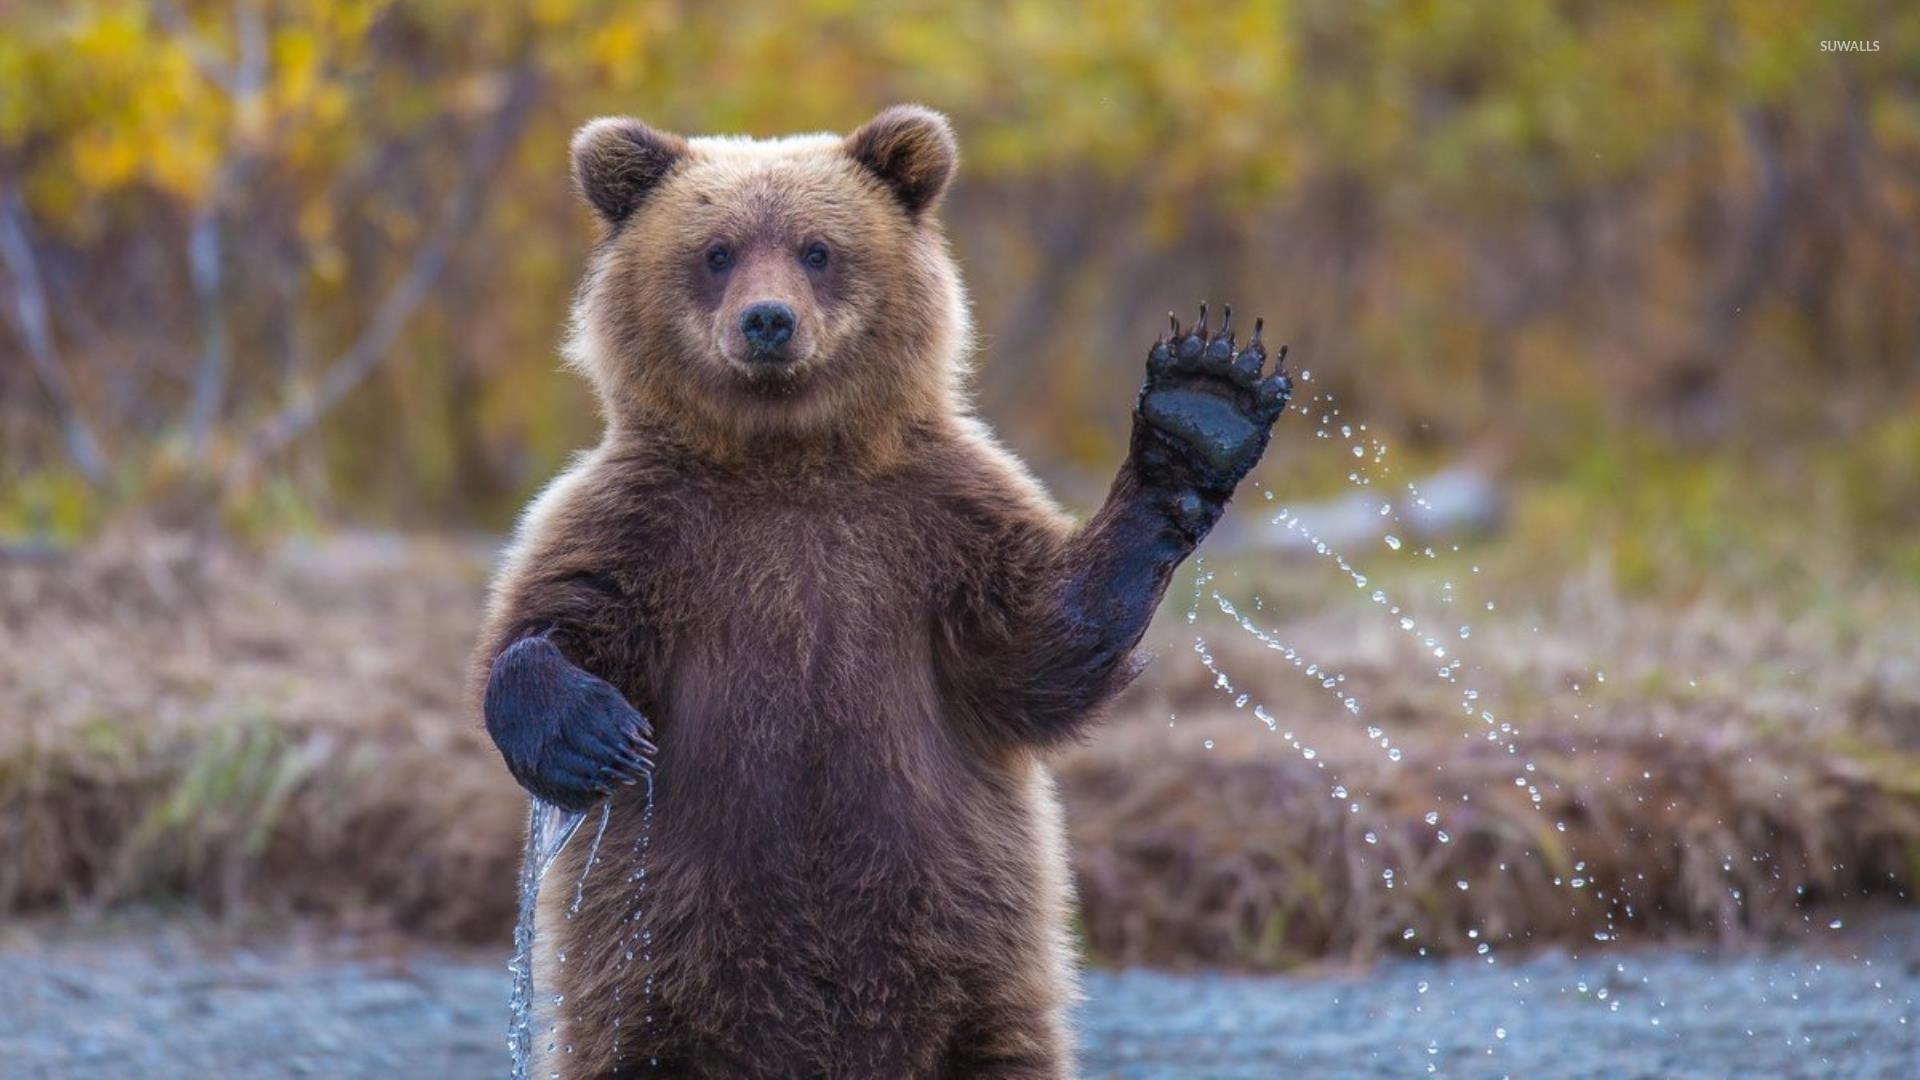 Koala Quotes Wallpapers Bear Cub Wallpaper Animal Wallpapers 33905